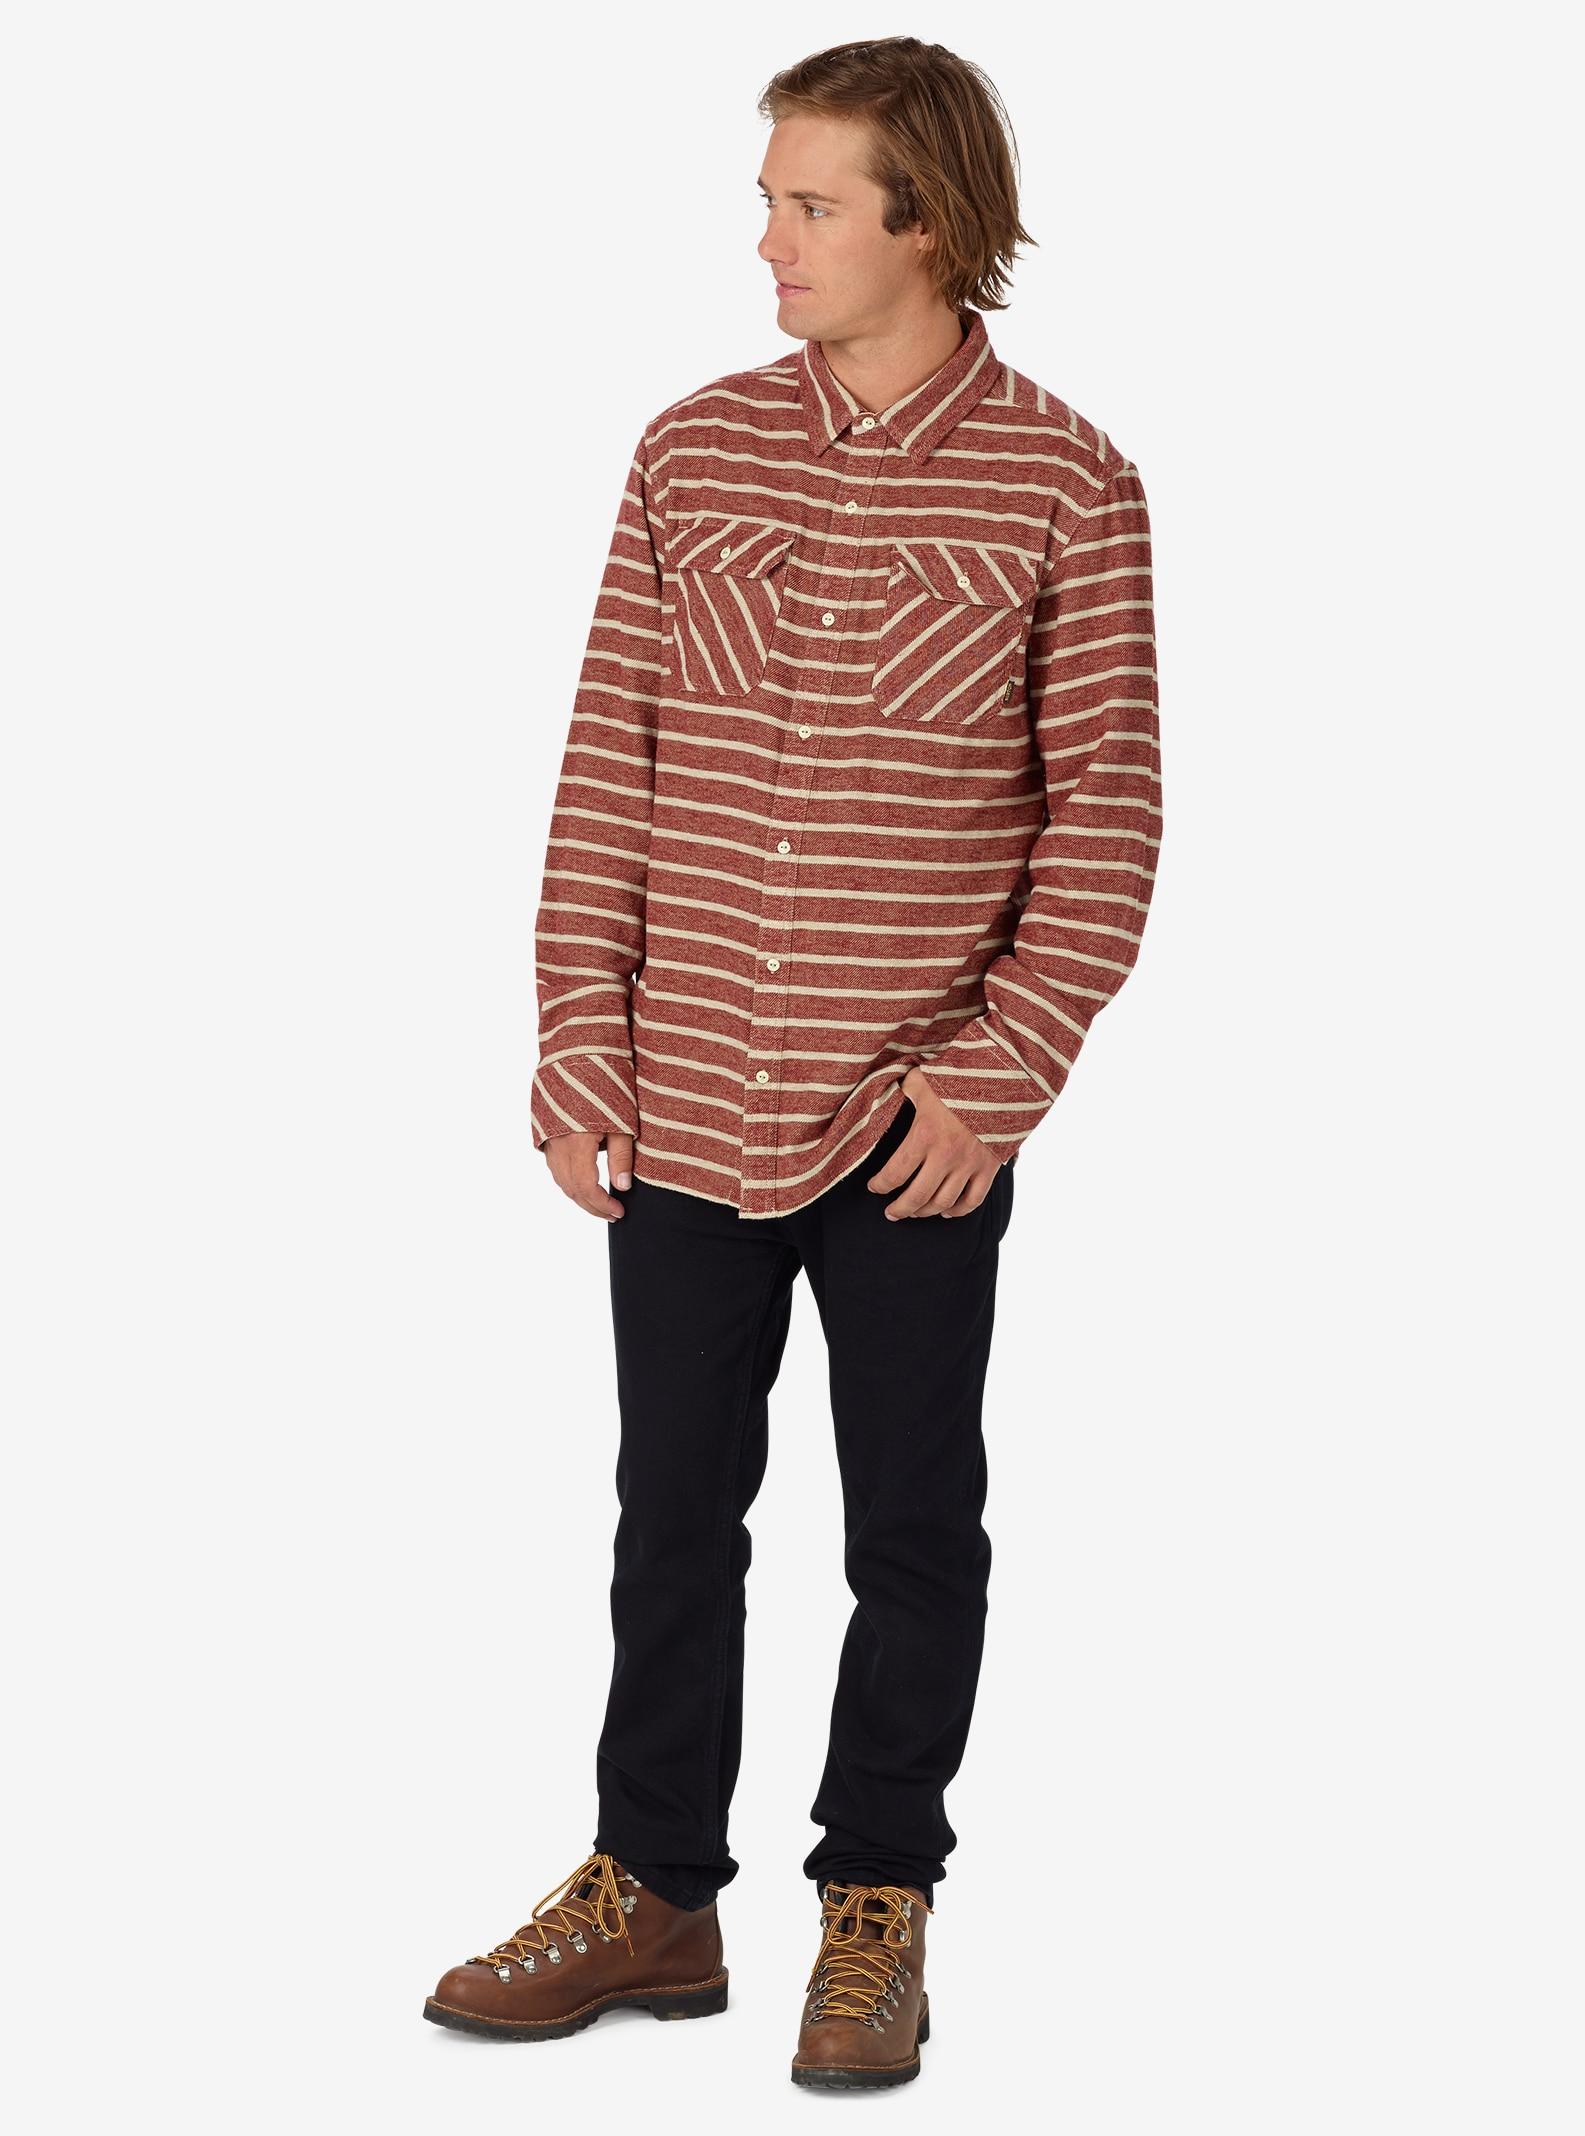 Burton Brighton Flannel shown in Rojo Dock Stripe